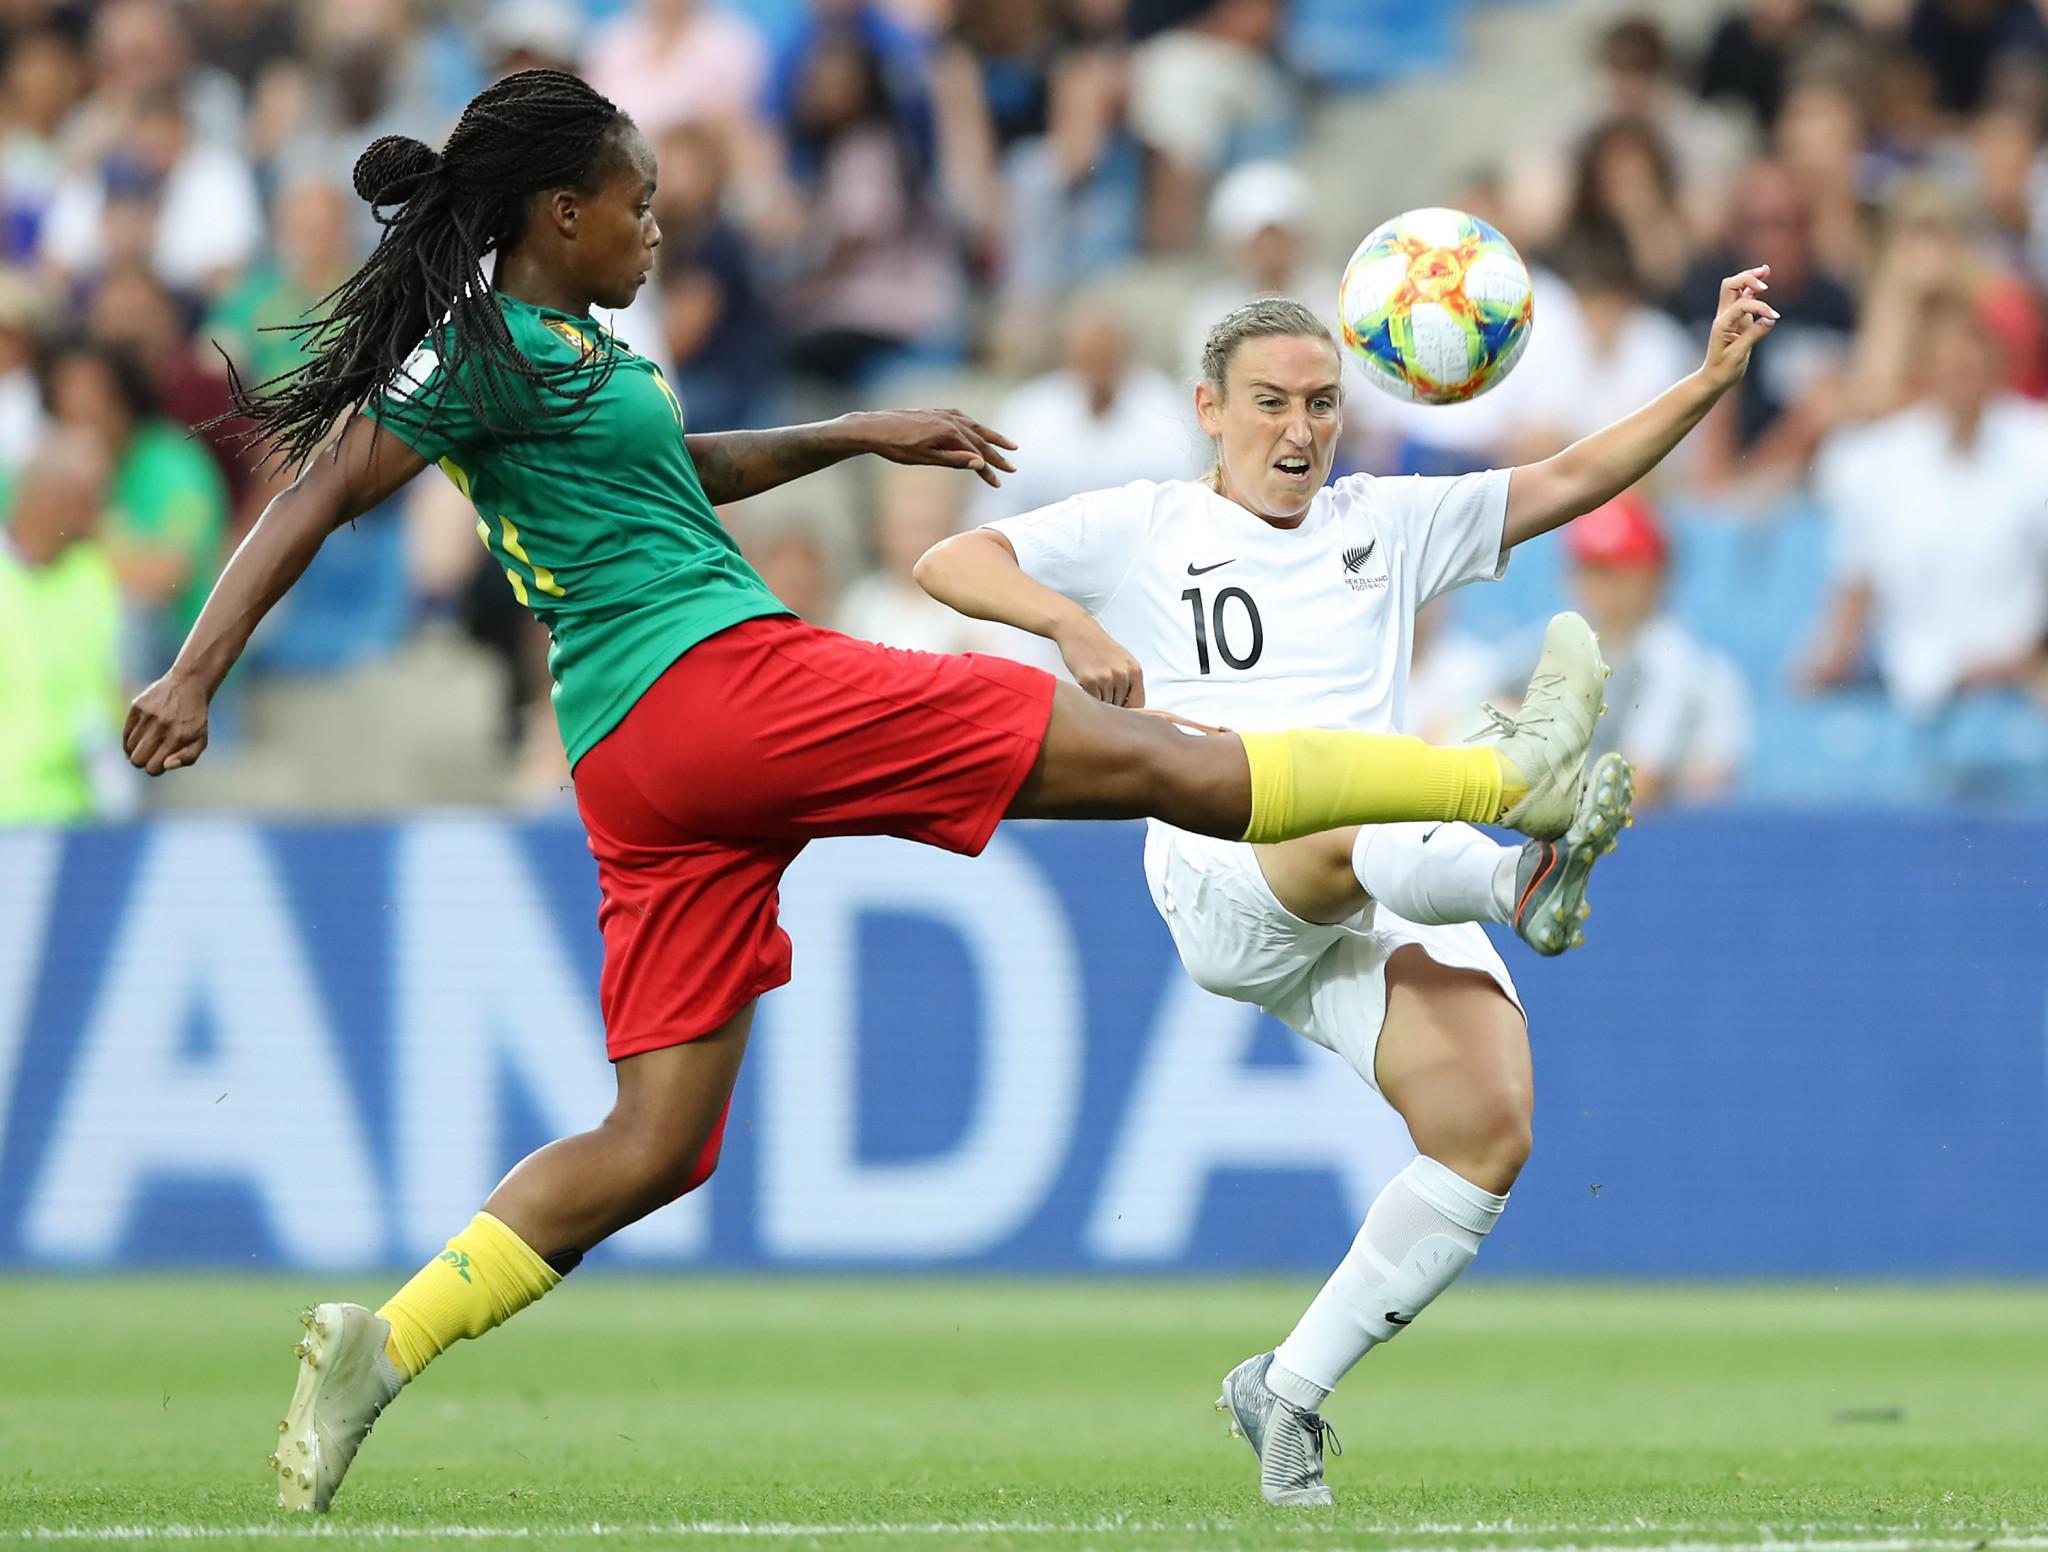 Cameroon score last-gasp winner to reach FIFA Women's World Cup last 16